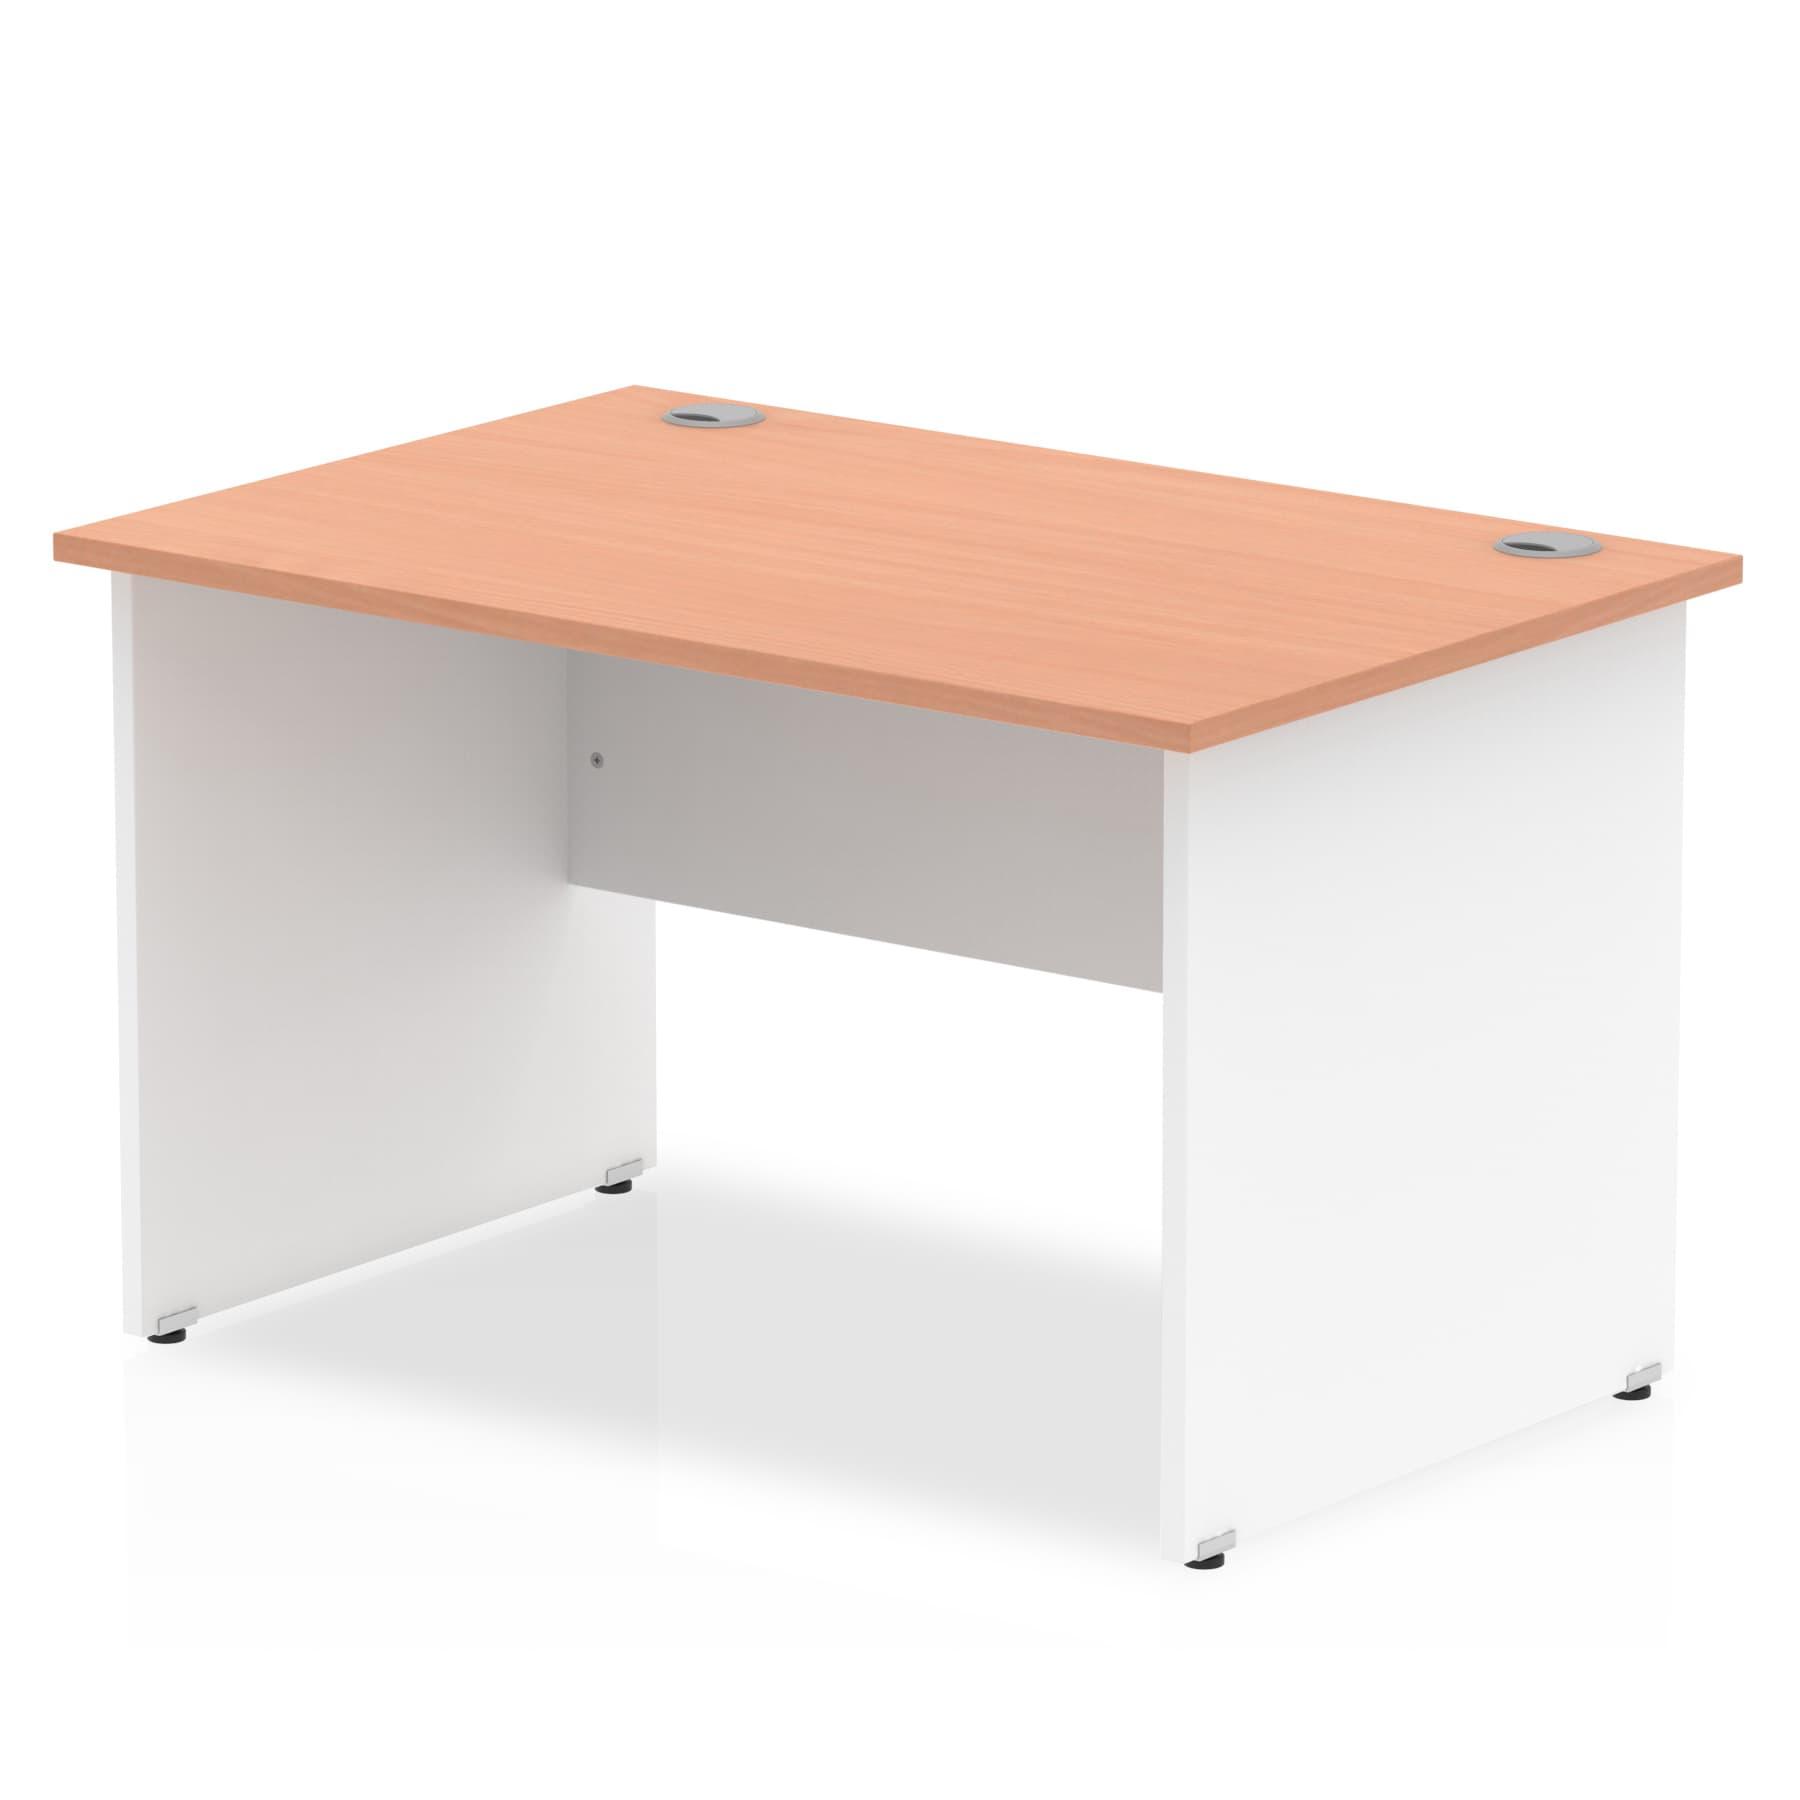 Impulse Panel End 1200 Rectangle Desk with White Panels